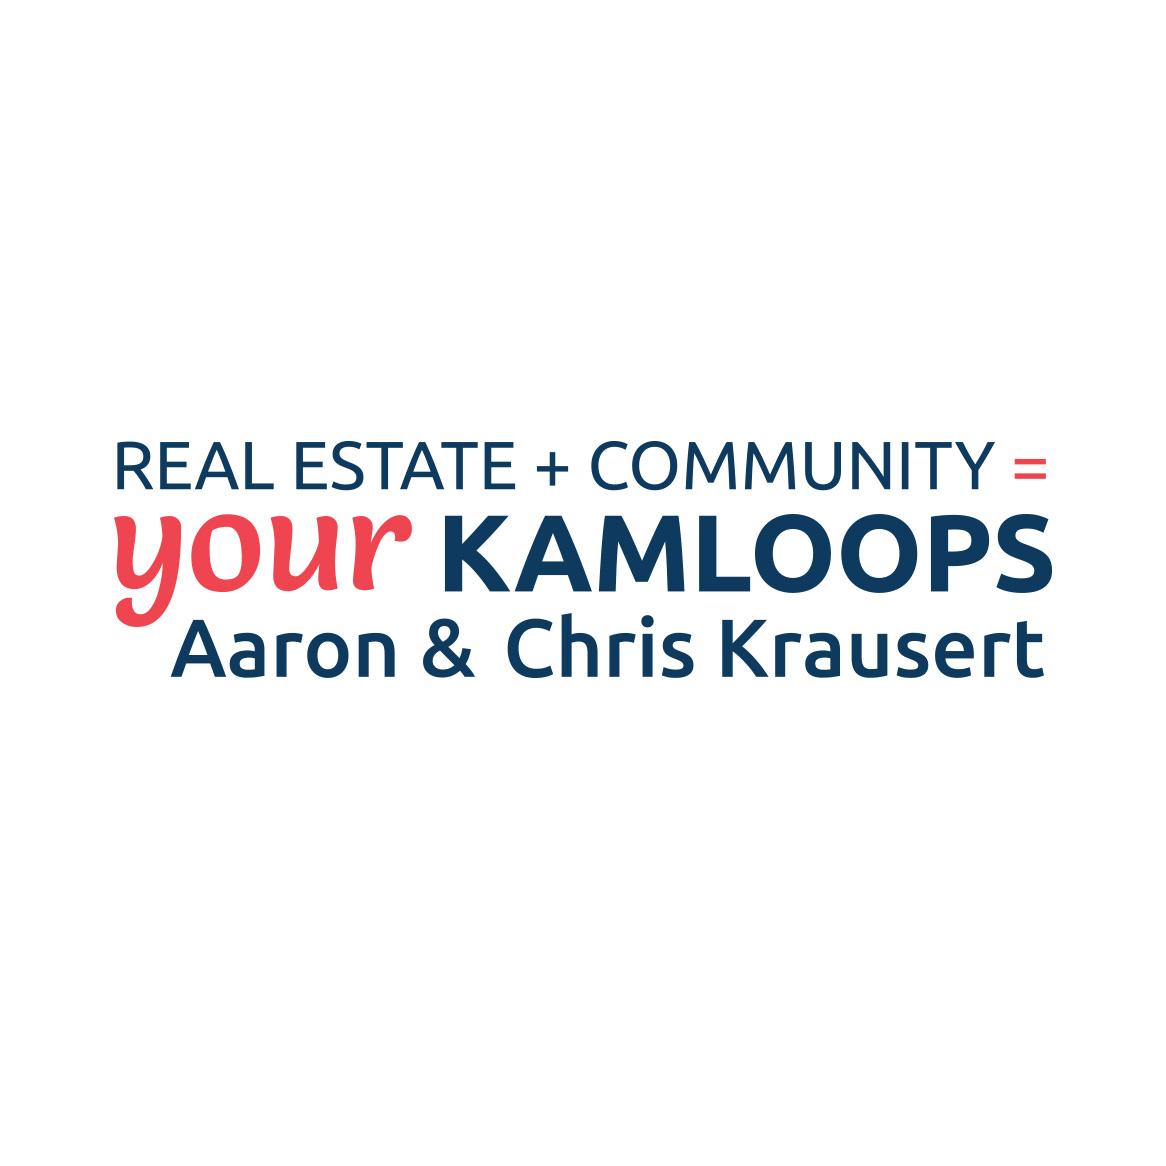 Sample image of logo design for Your Kamloops.